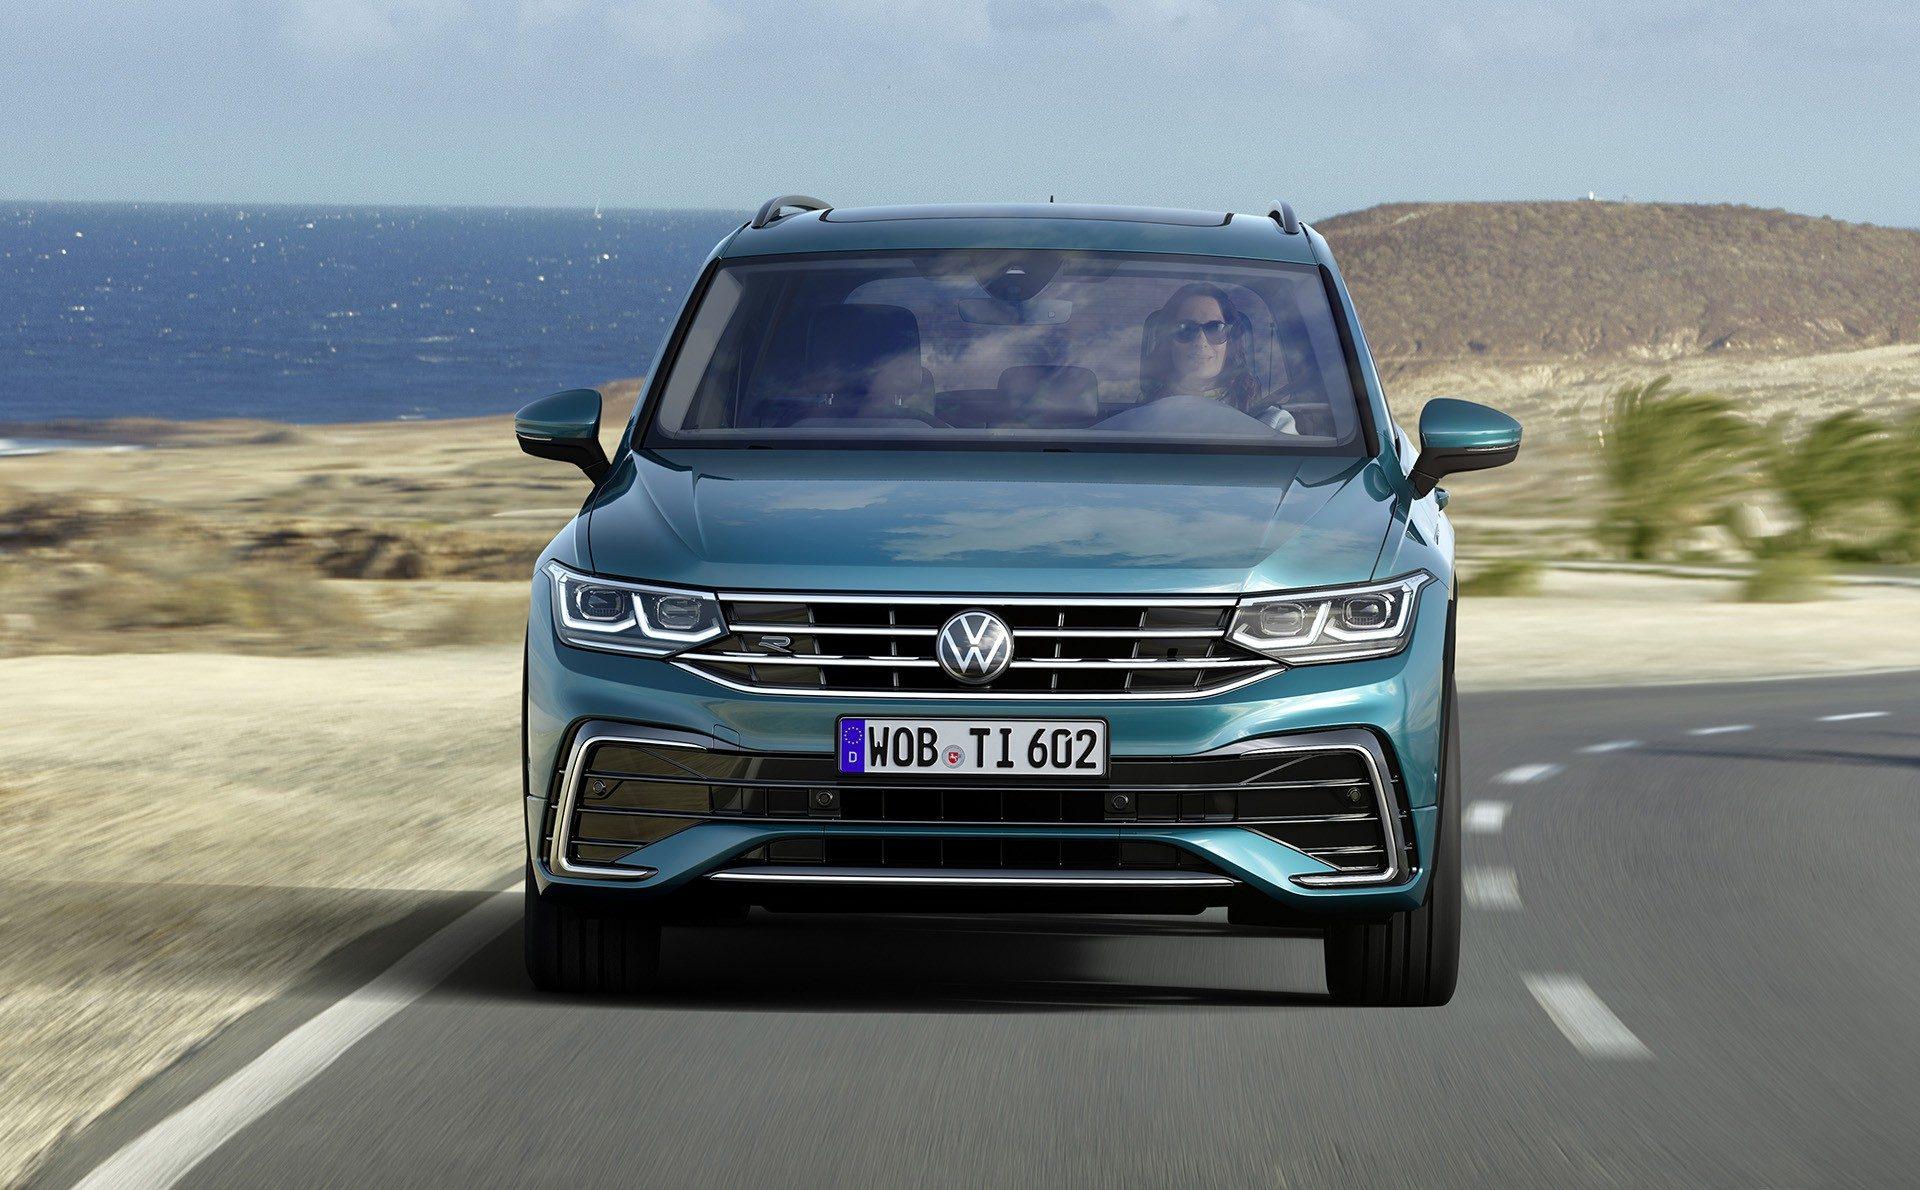 2021-VW-Tiguan-FL-5